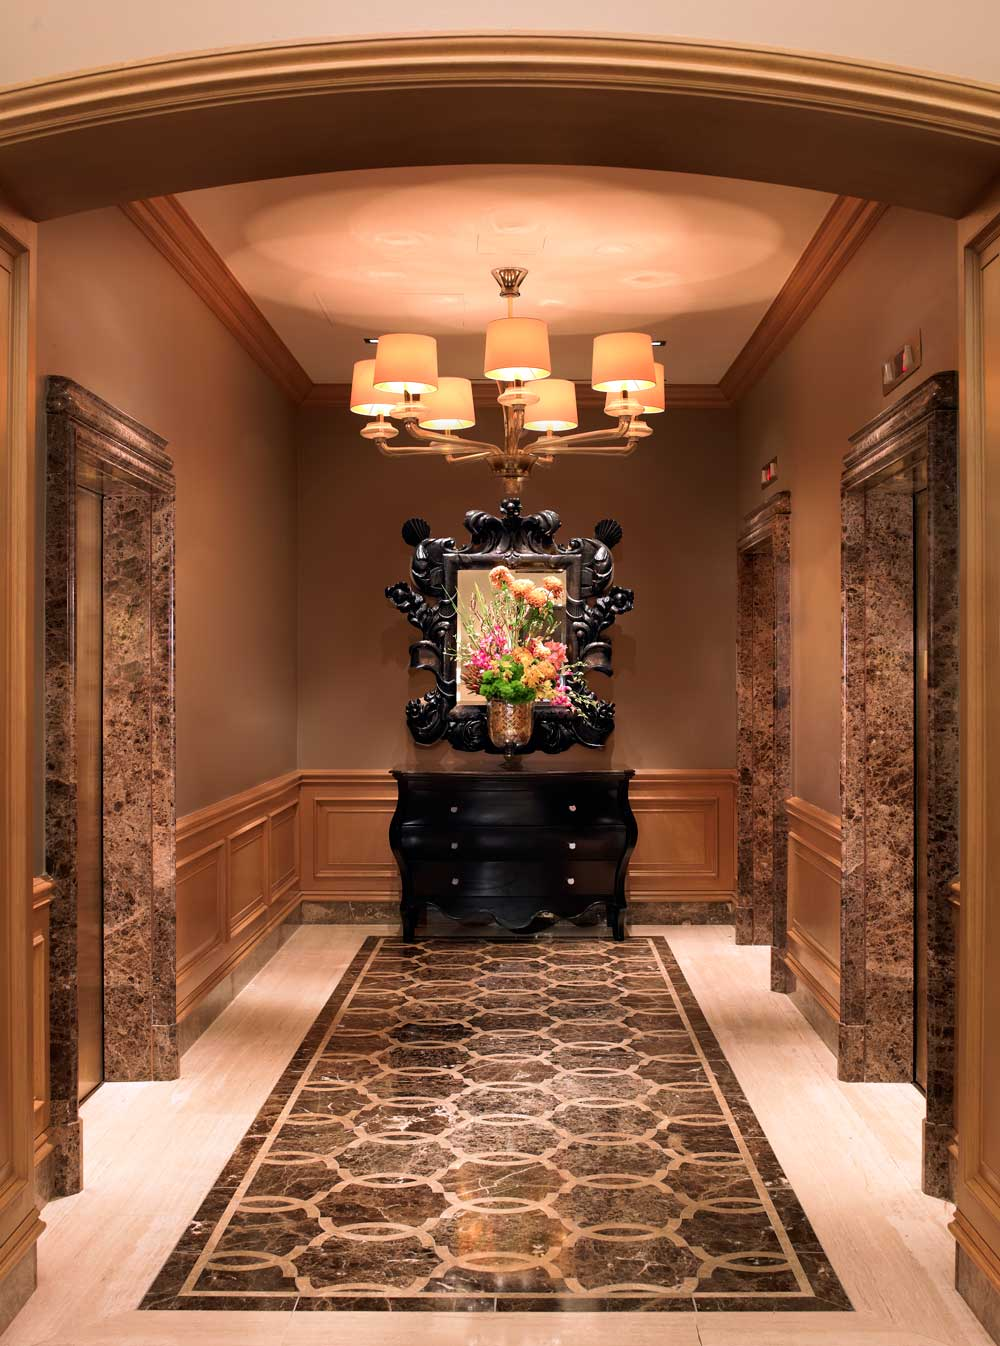 Lobby at The St Regis Houston, Tx